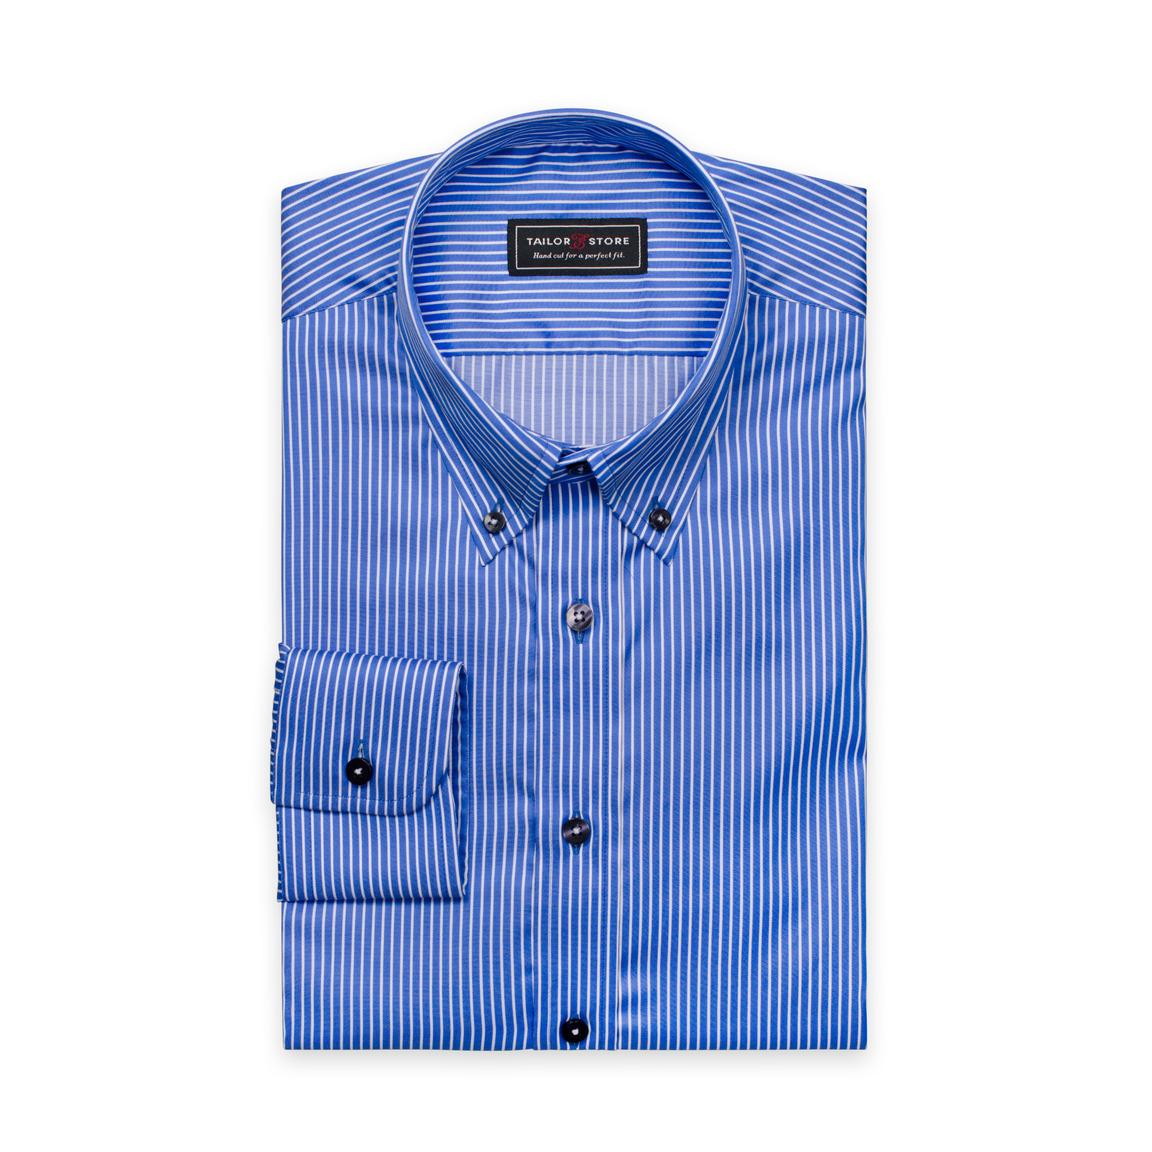 Blau/weiß gestreiftes Twill-Hemd